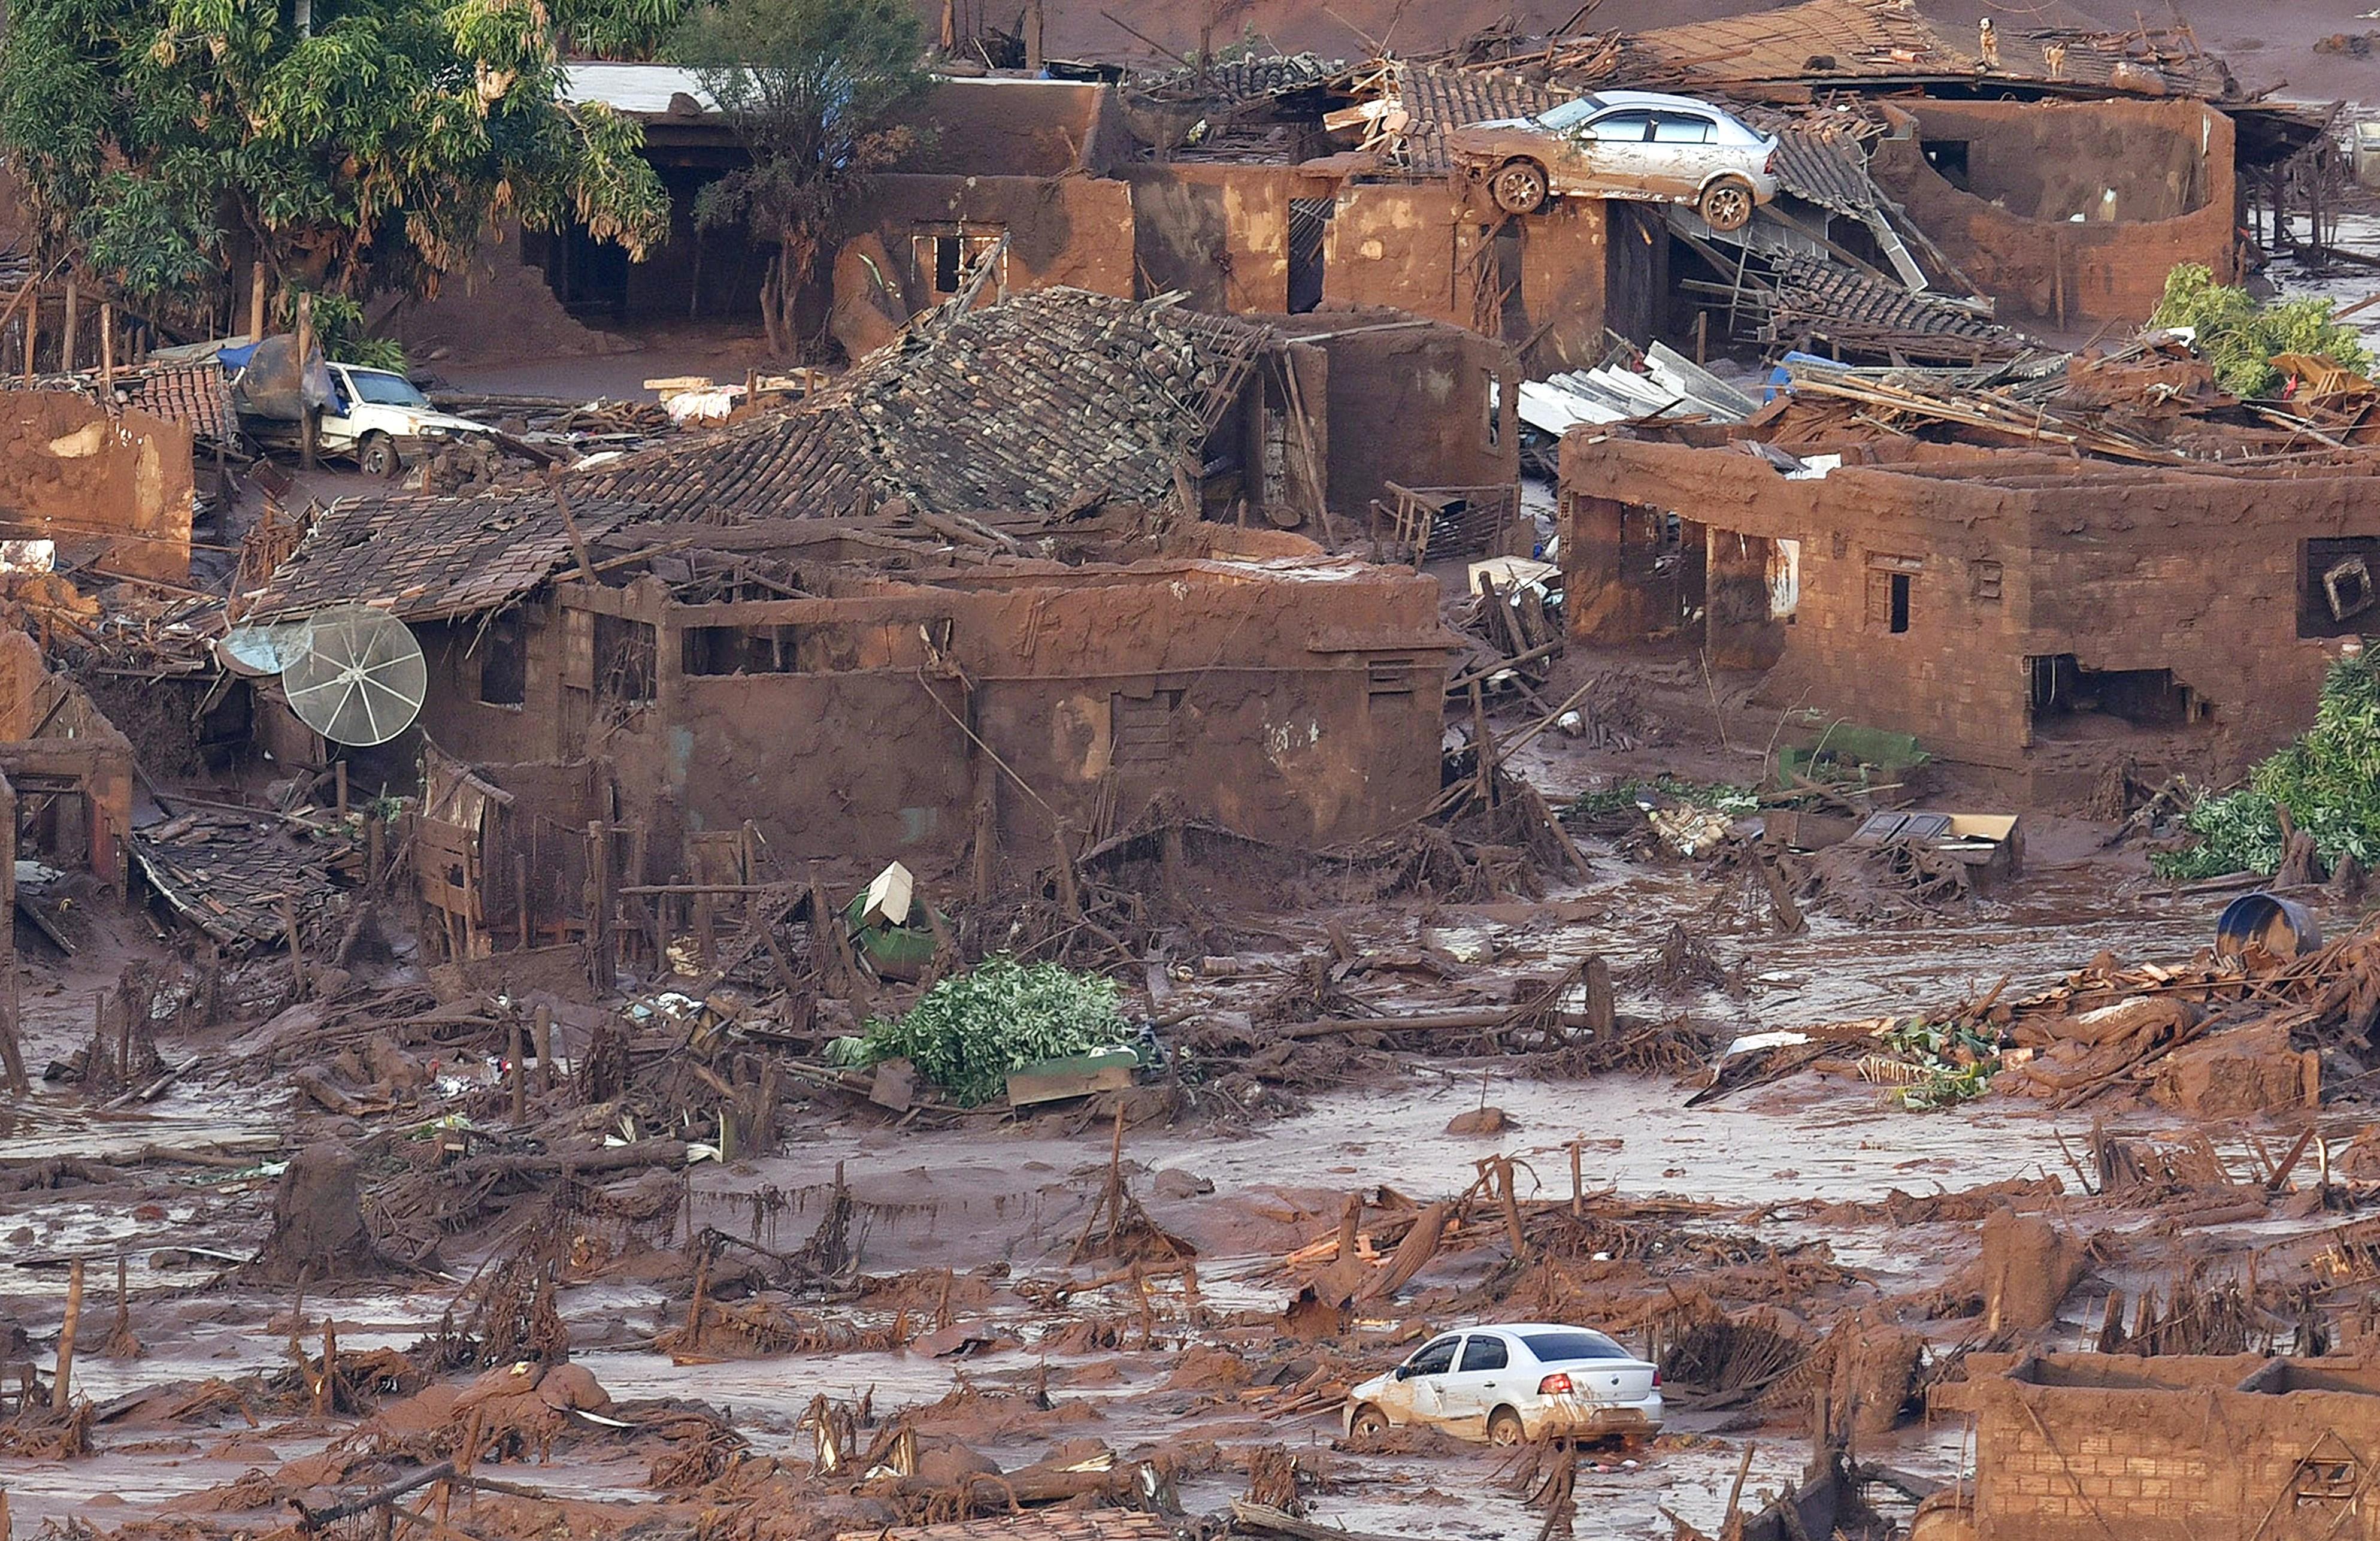 BRAZIL-MINING-ACCIDENT-AUSTRALIA